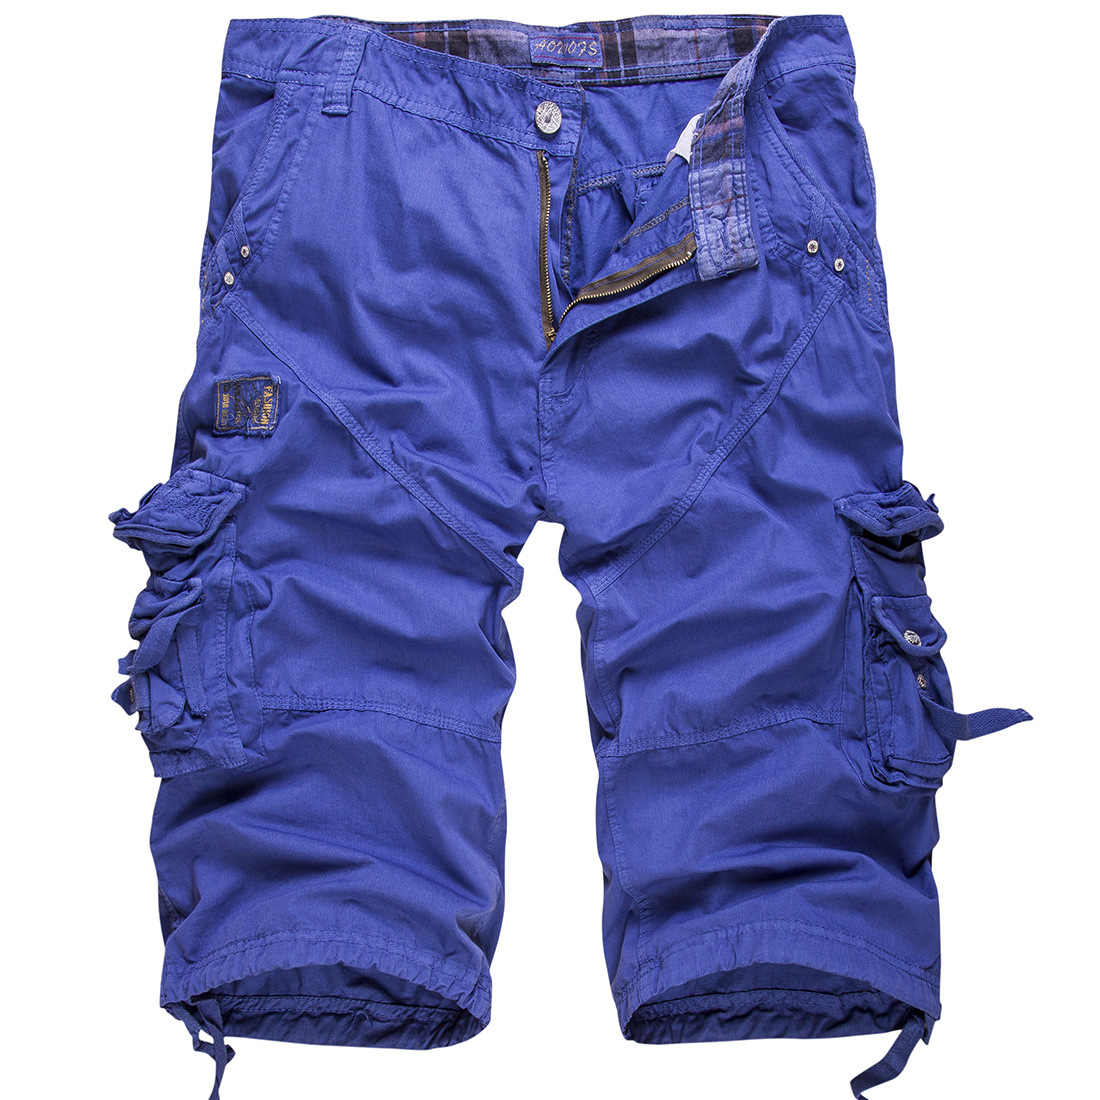 Cargo Pants Men Loose Trousers Summer Baggy Cargo Cotton Calf Length Plus Size Pants Casual Trouser Male Large Loose Big Size